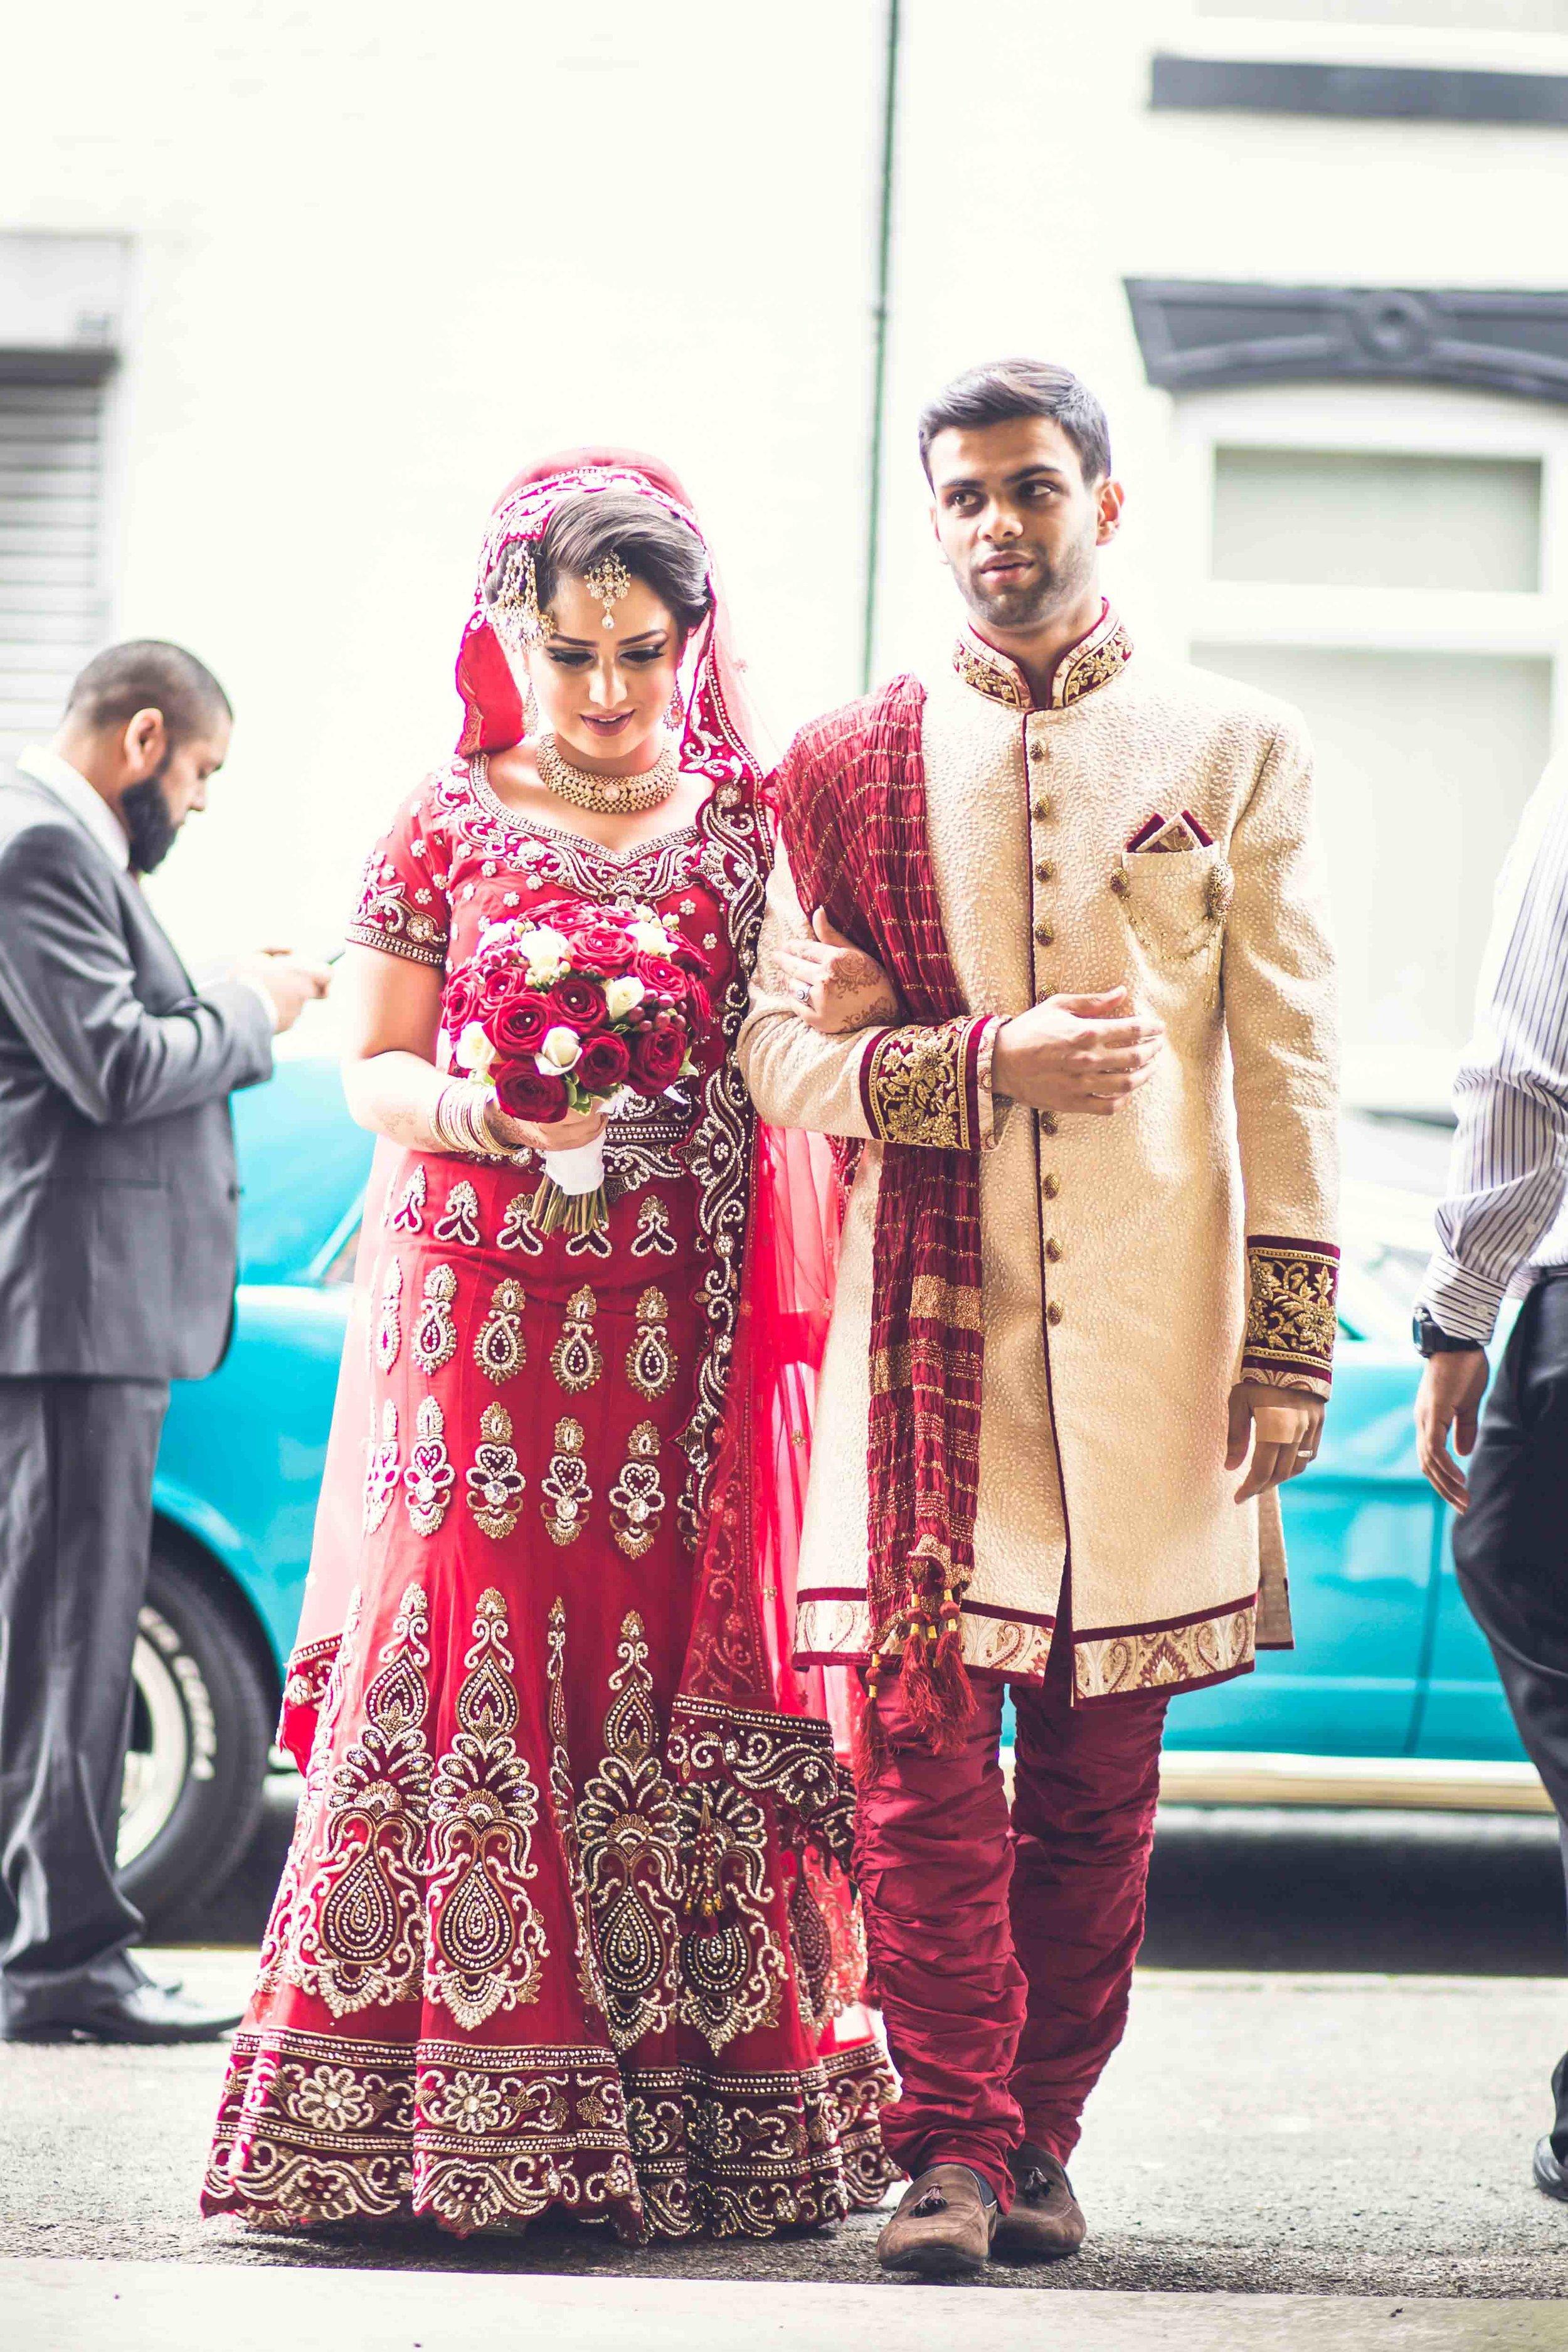 Asian Wedding Photographer Opu Sultan Photography Lyme Park Scotland Edinburgh Glasgow London Manchester Liverpool Birmingham Wedding Photos prewed shoot Jams & Tams Blod-33.jpg